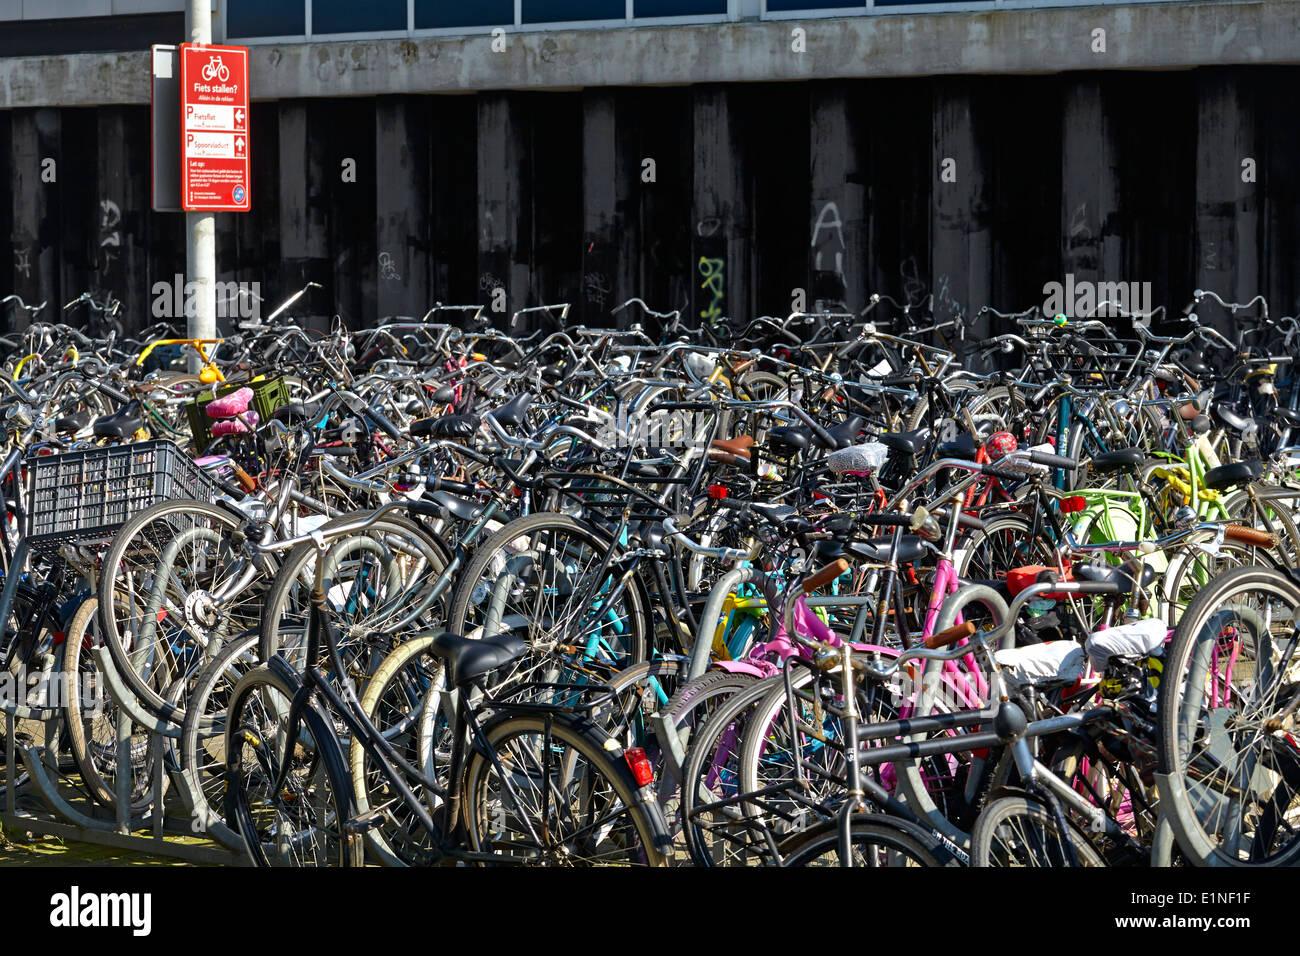 amsterdam fahrrad parken holland niederlande stockfoto bild 69928923 alamy. Black Bedroom Furniture Sets. Home Design Ideas